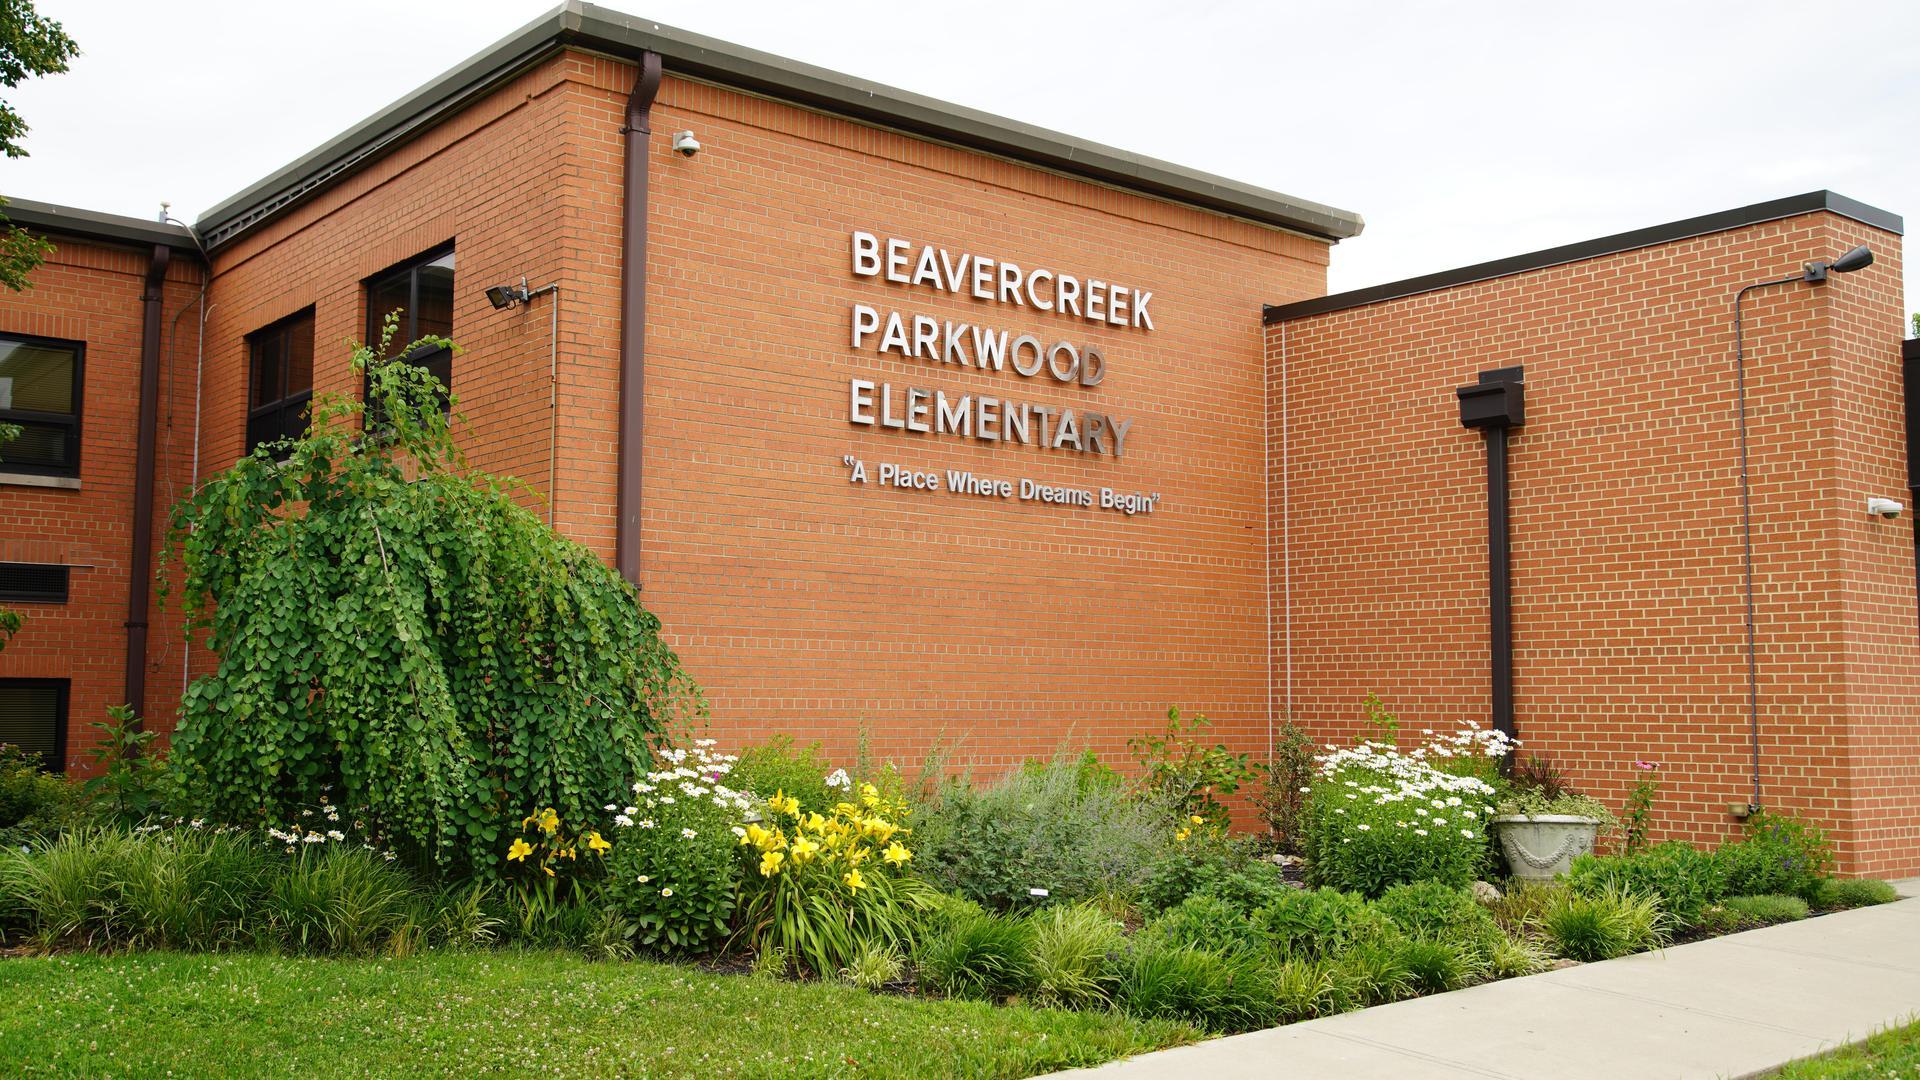 Parkwood Elementary School